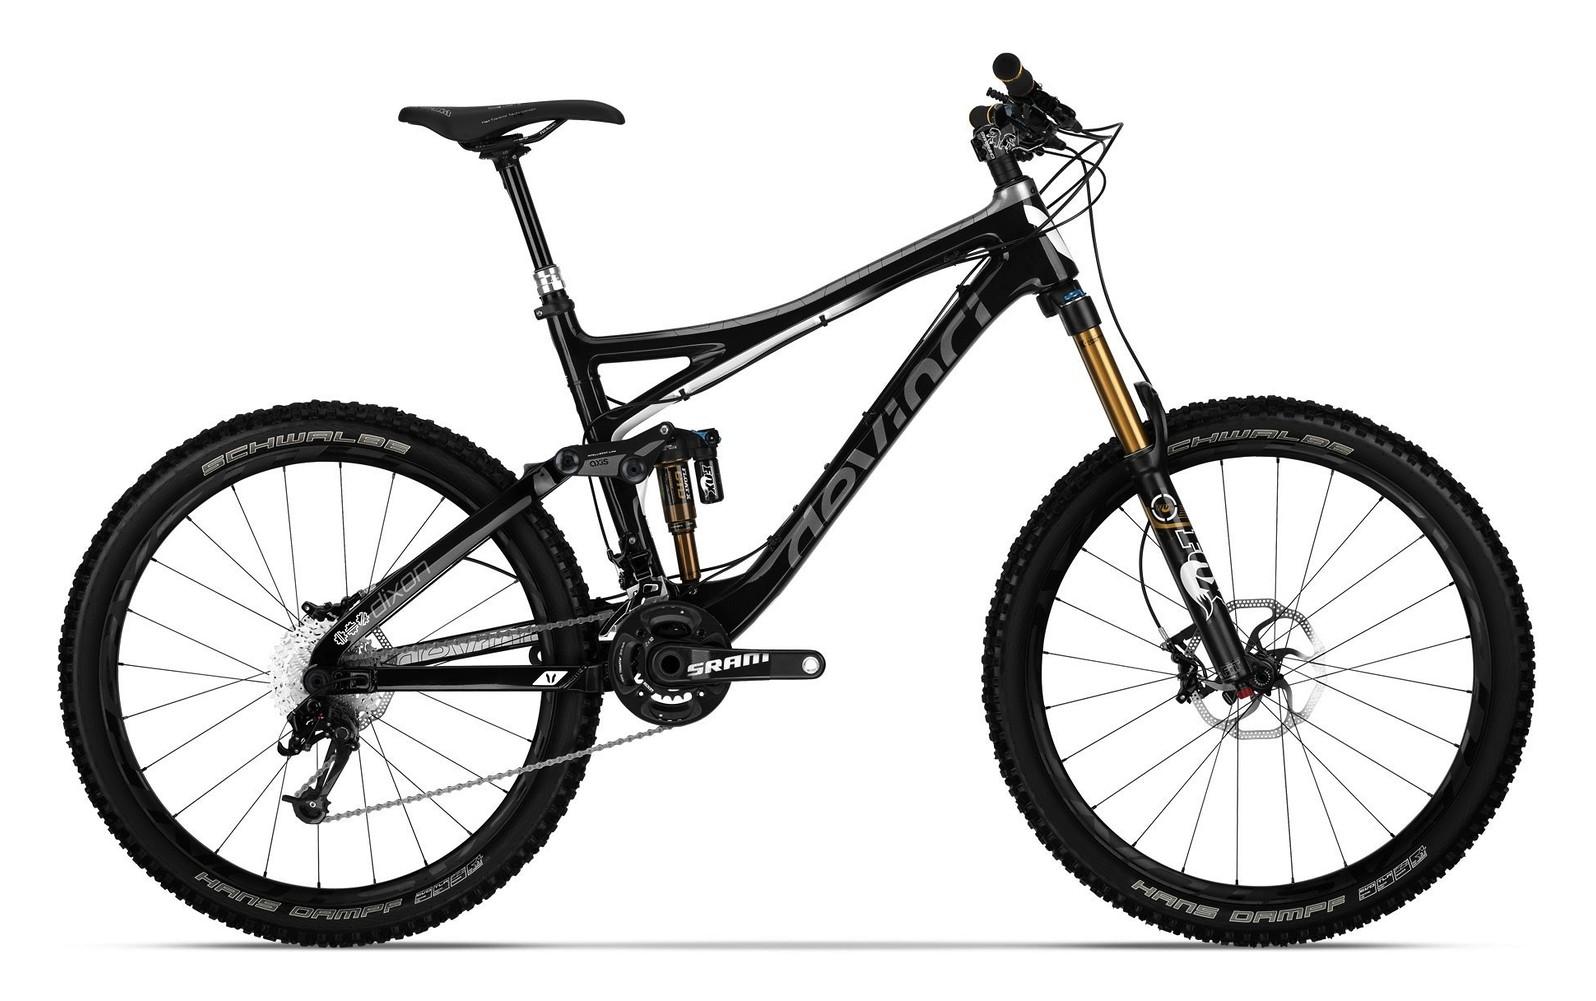 Bike - 2014 Devinci Dixon Carbon RR